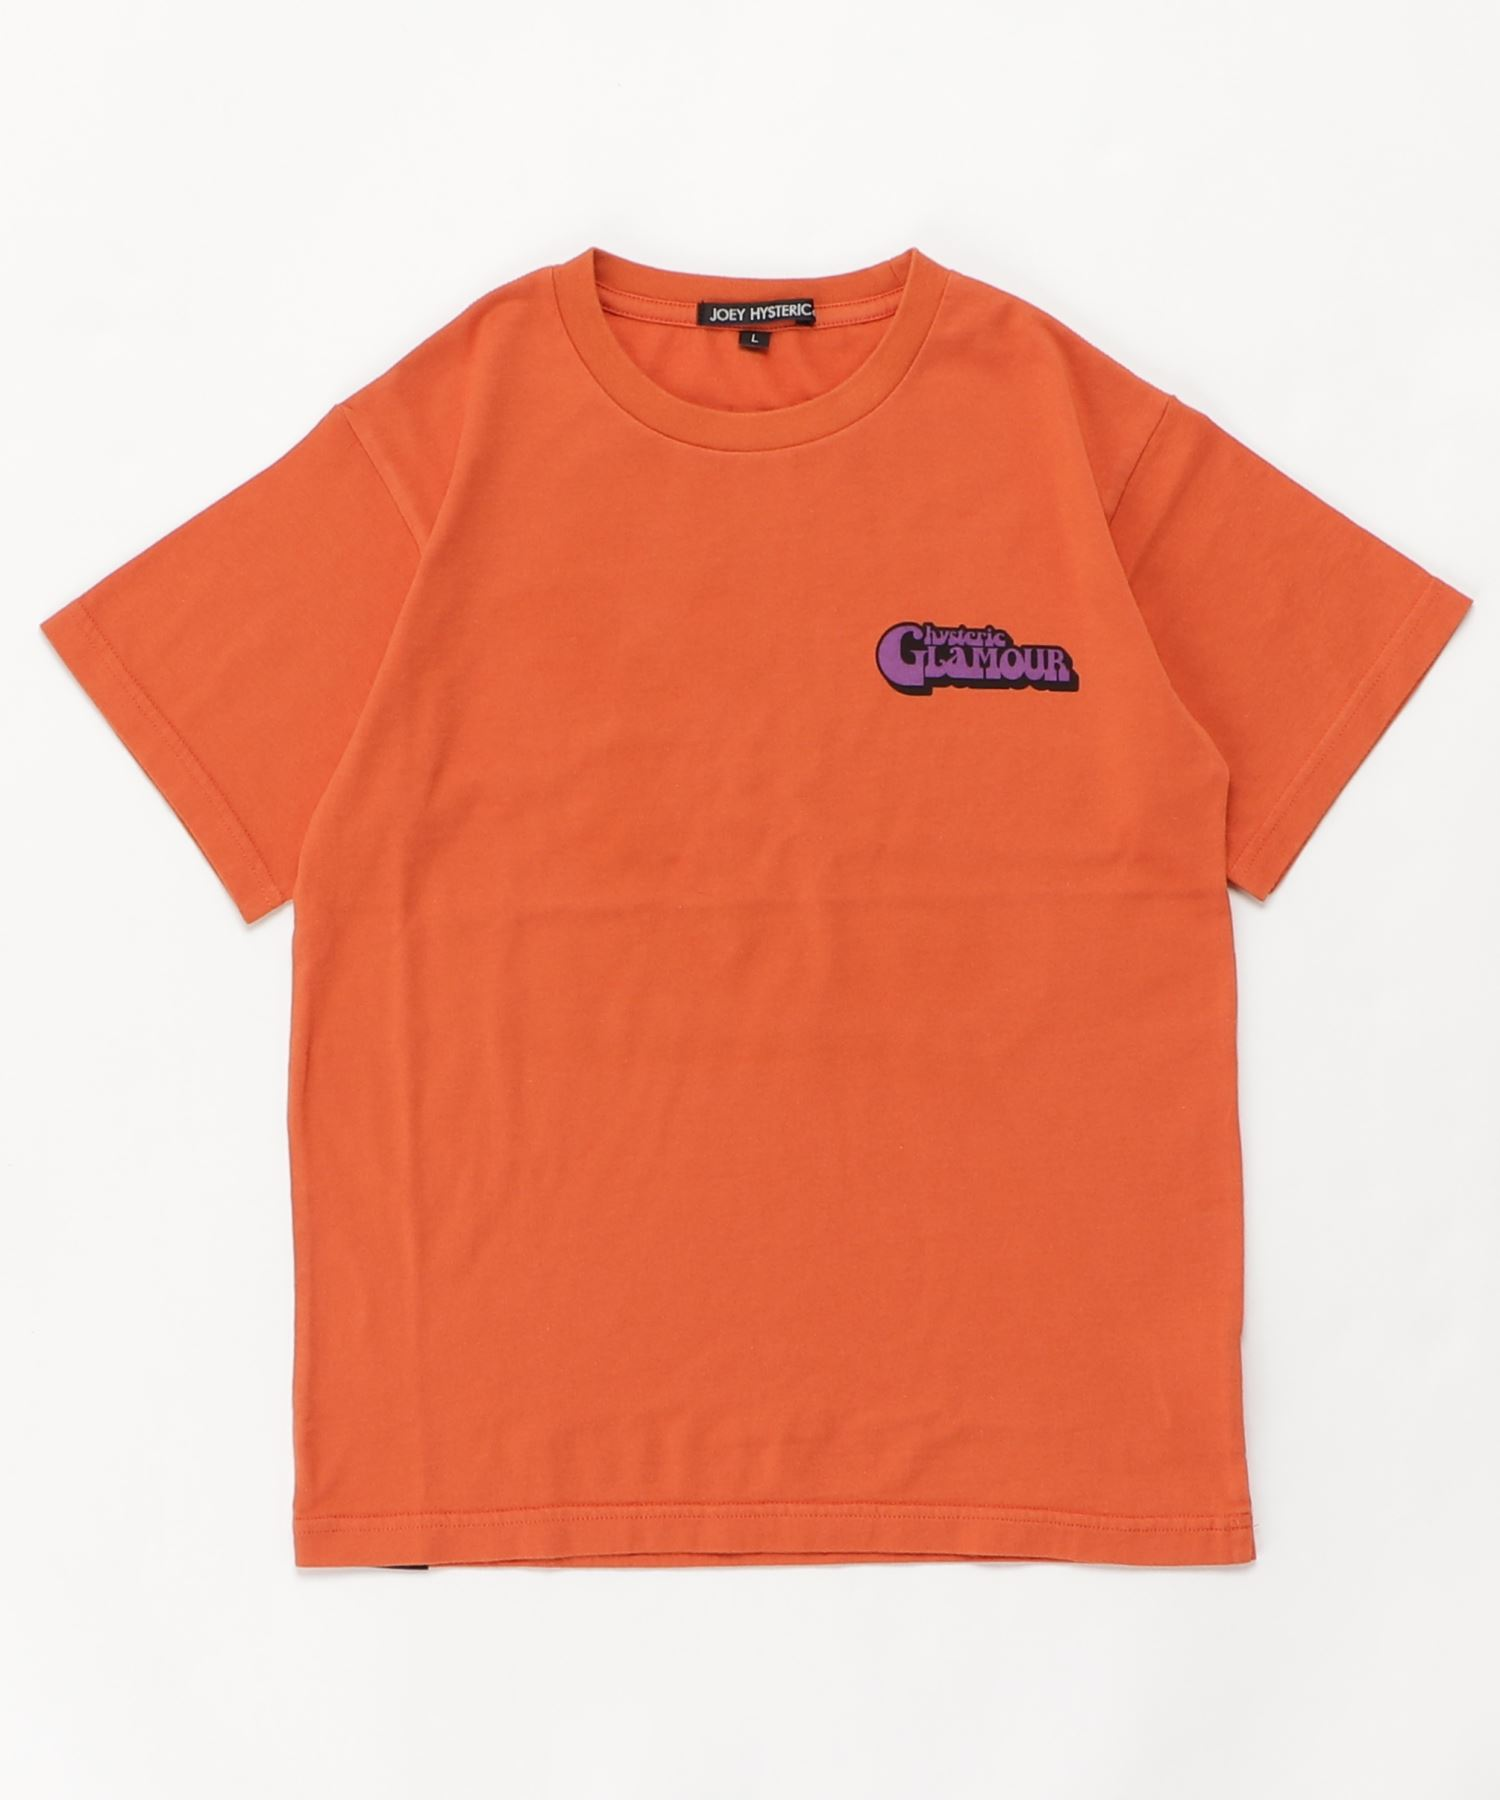 SPECTACULAR SOUNDS Tシャツ【L】